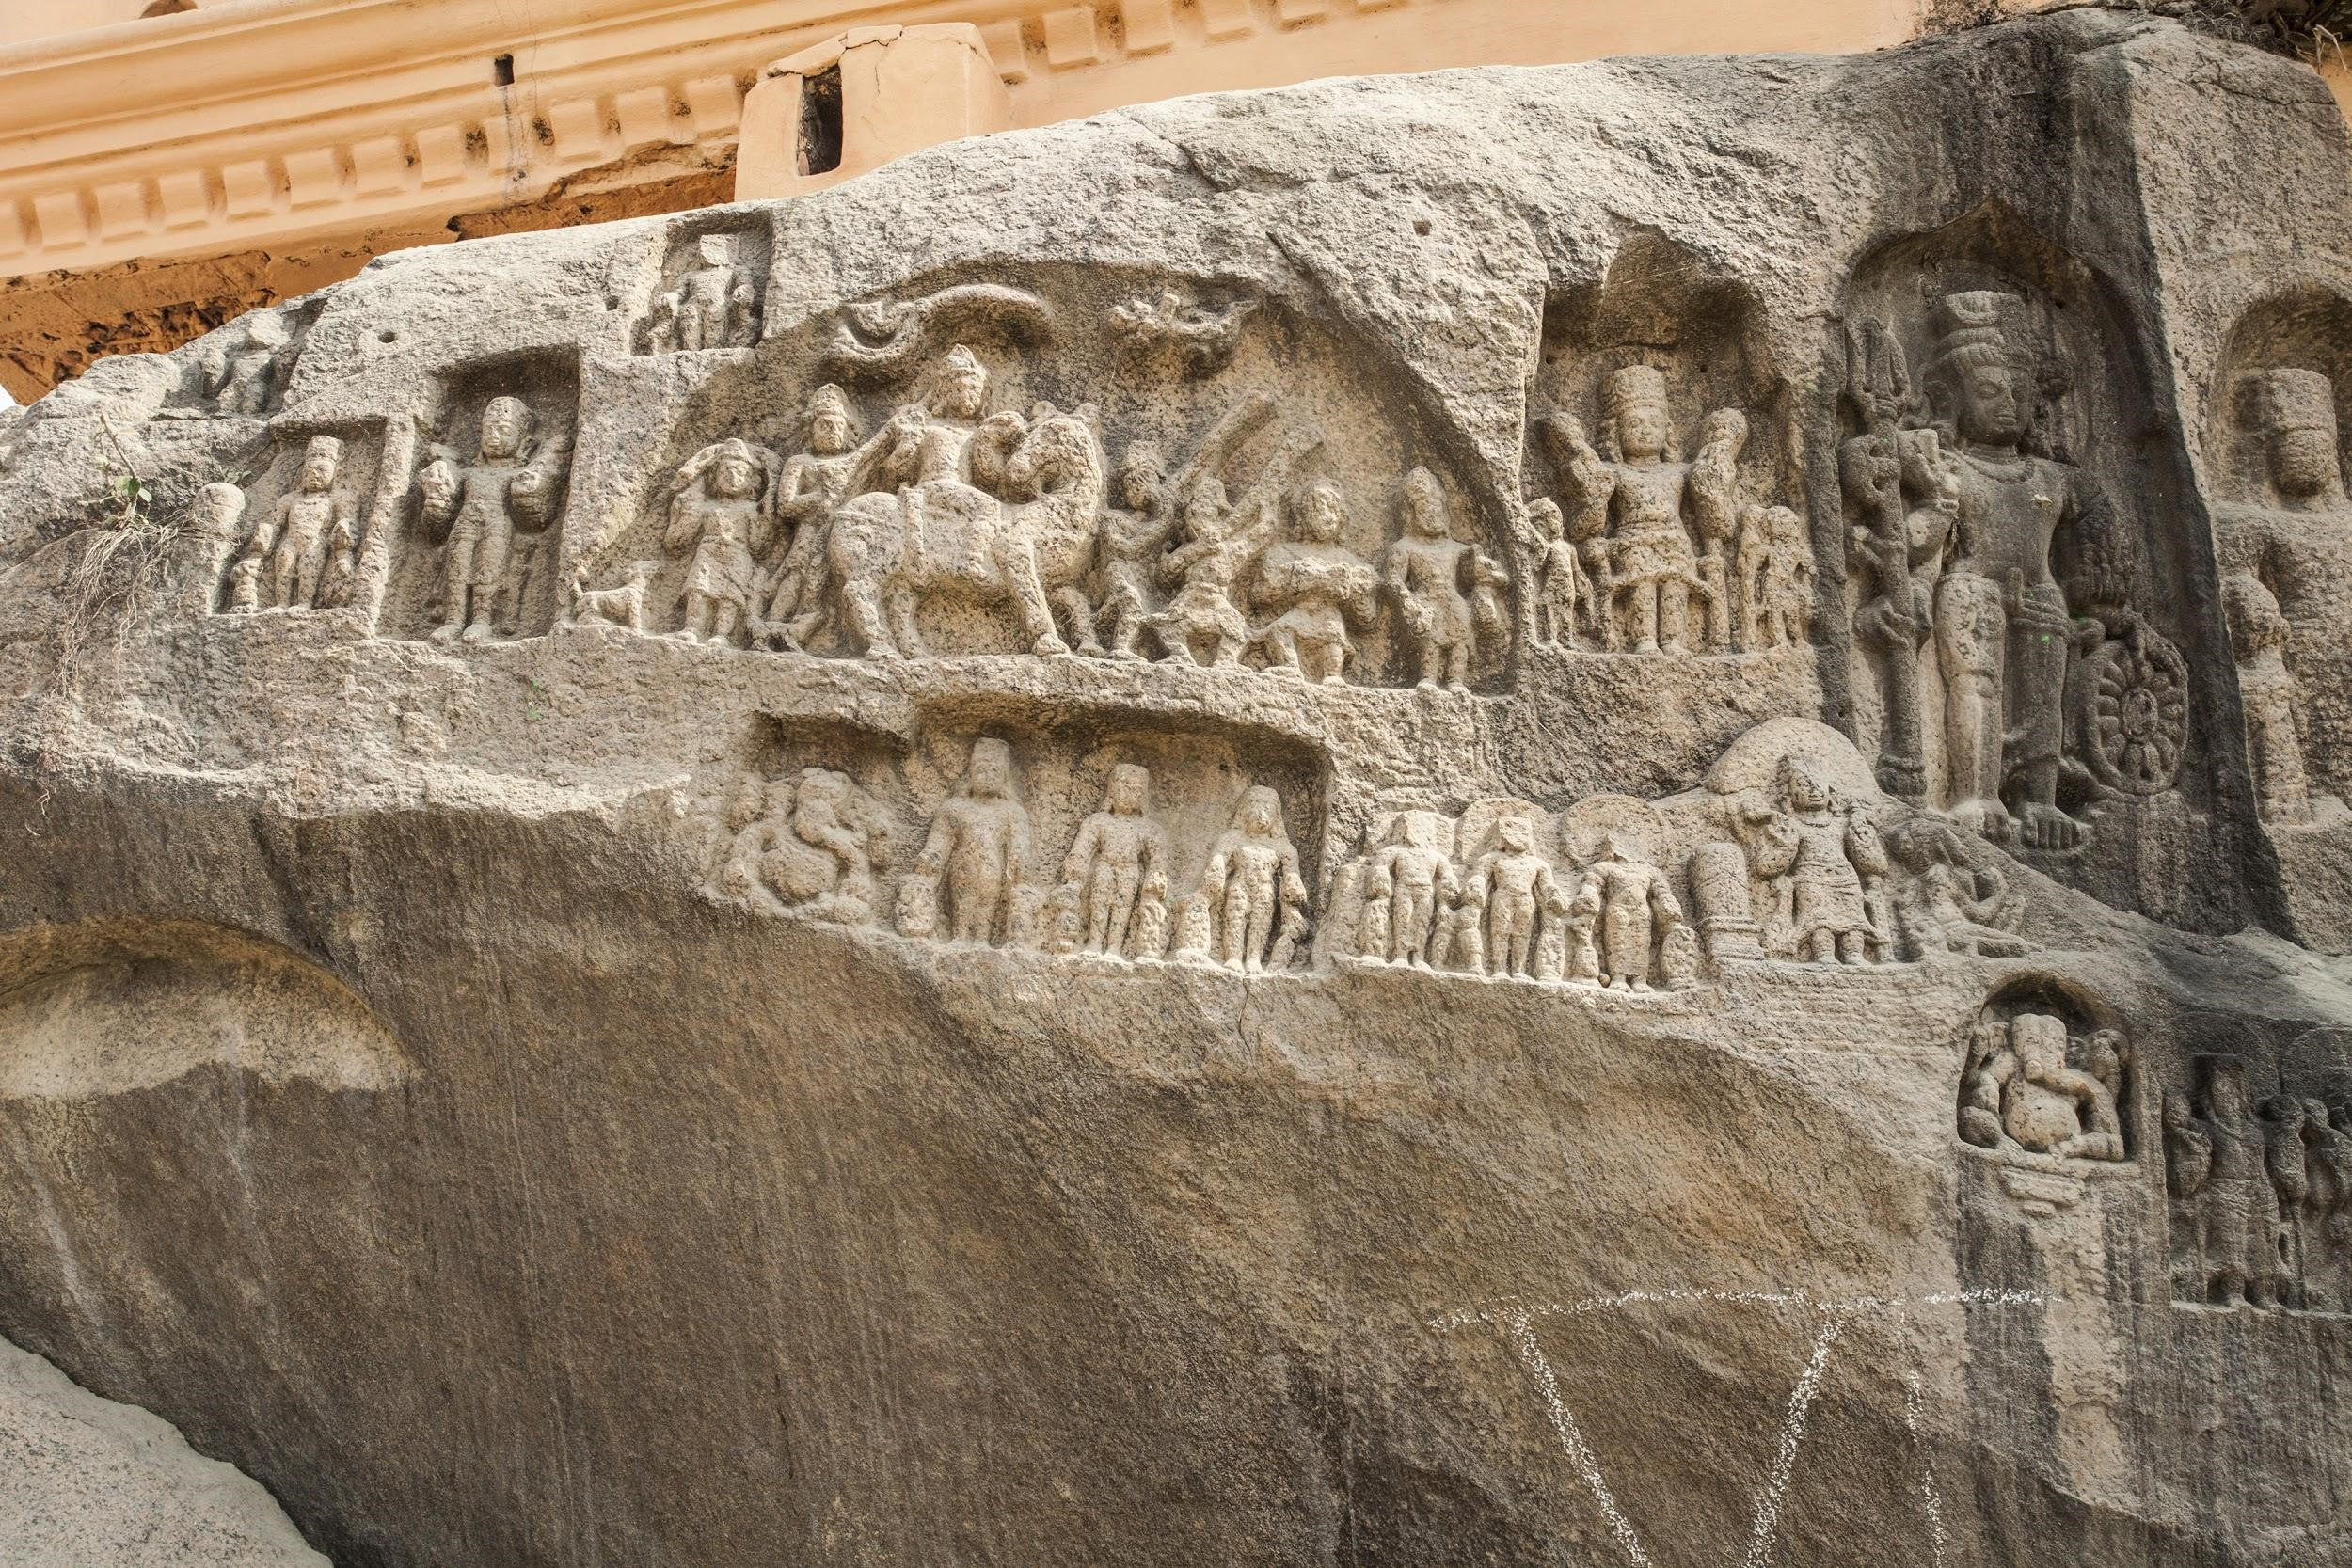 Shrine-jetties at Sultanganj. Circa sixth century AD